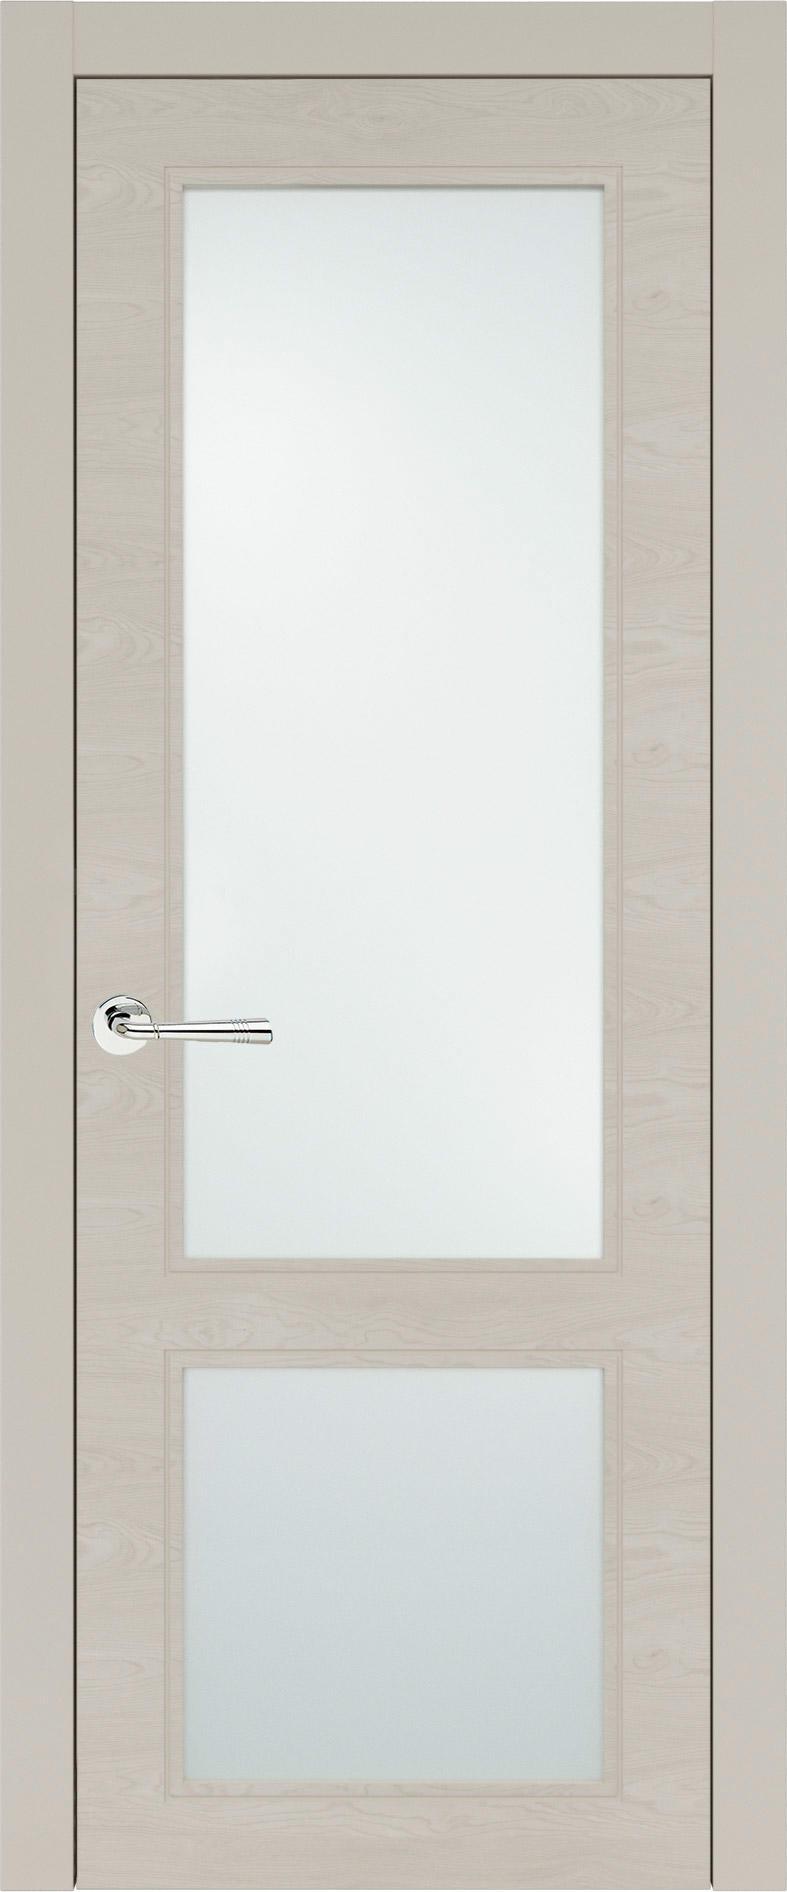 Dinastia Neo Classic цвет - Жемчужная эмаль по шпону (RAL 1013) Со стеклом (ДО)